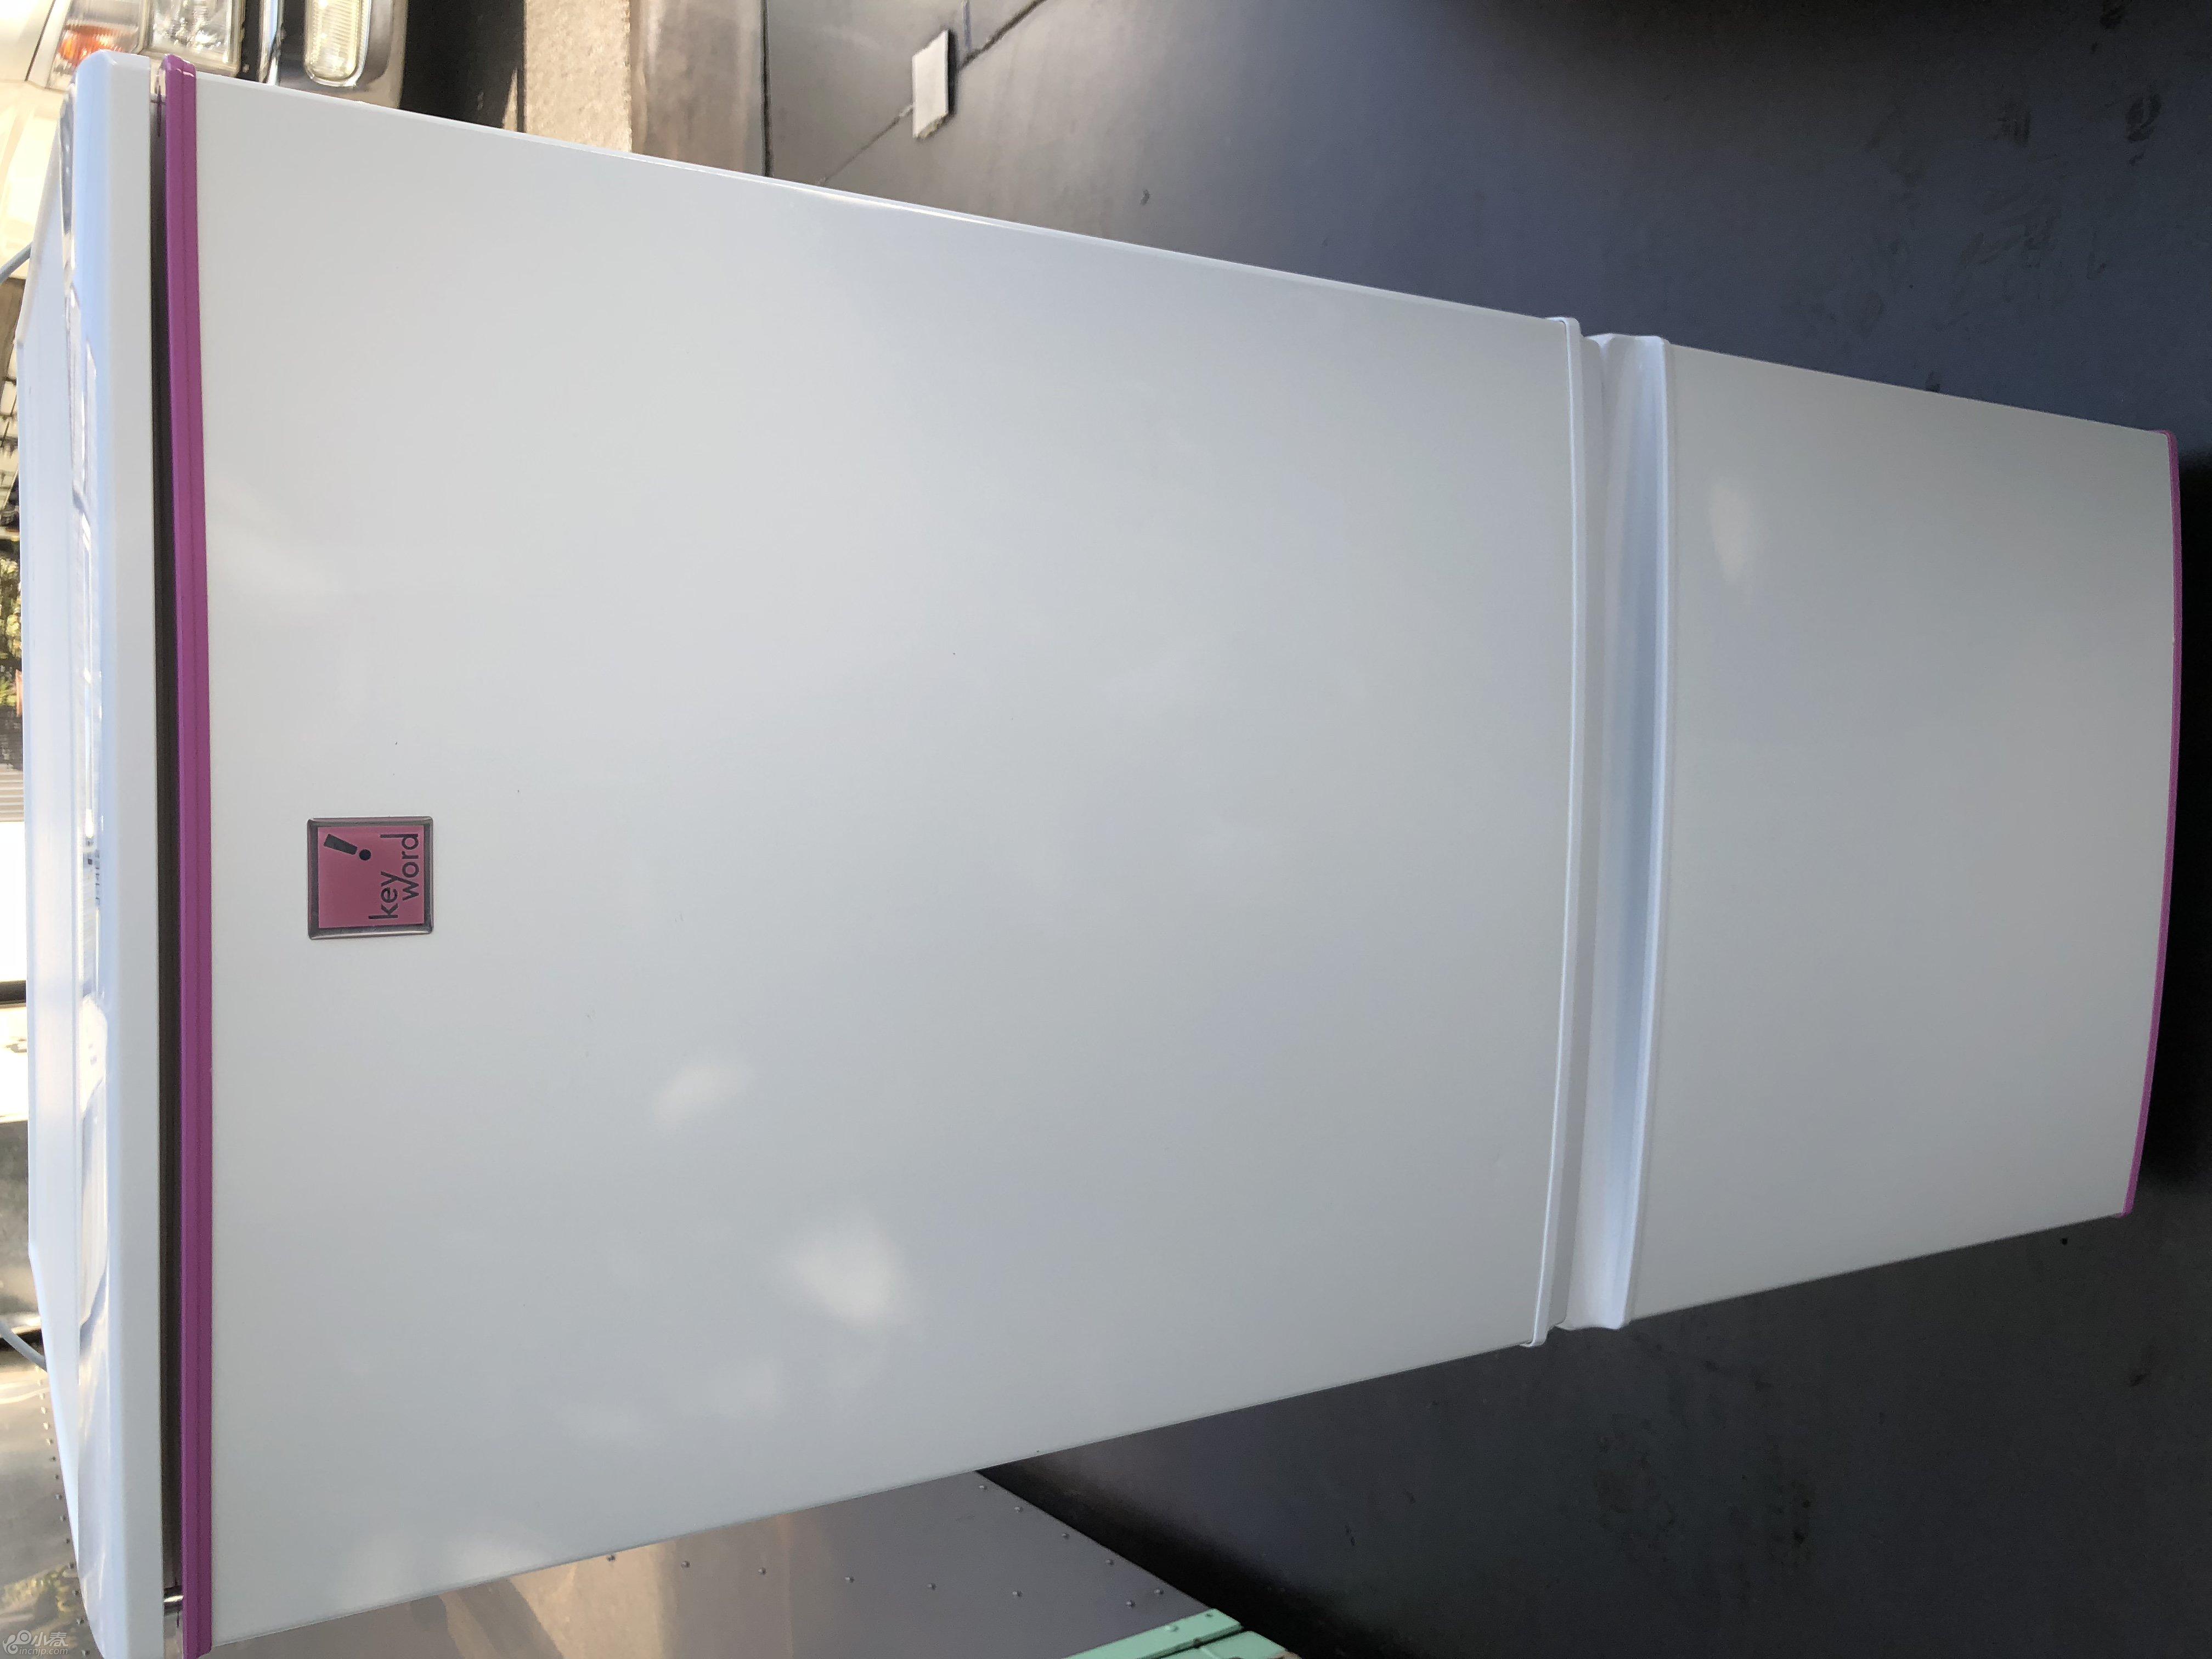 6EEC39E8-F006-4650-A56B-A50FEEE8BE1E.jpeg